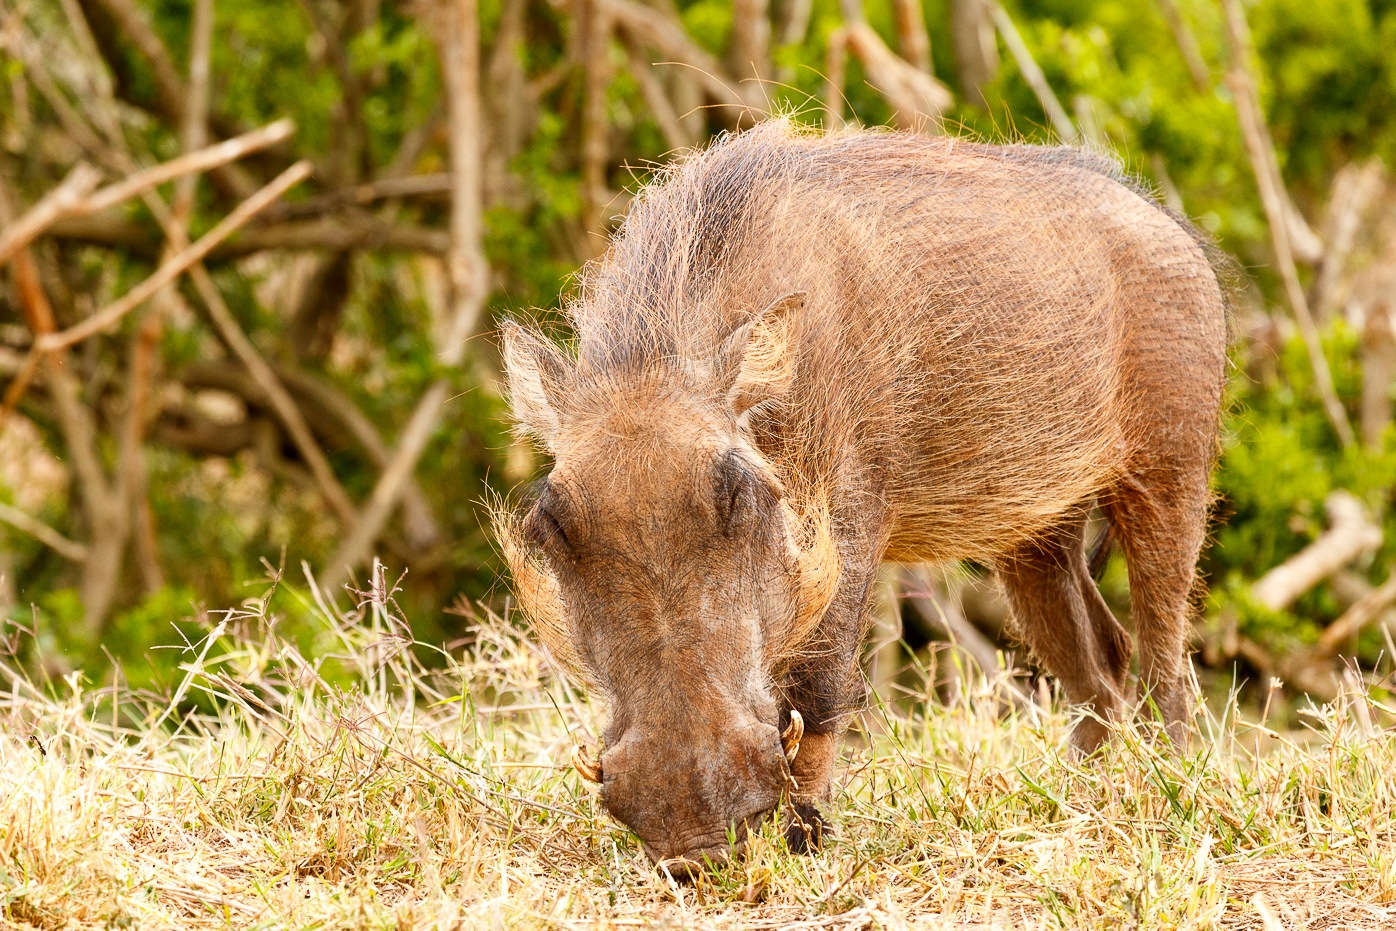 Warthog enjoying his grass by Charissa de Scande Lotter